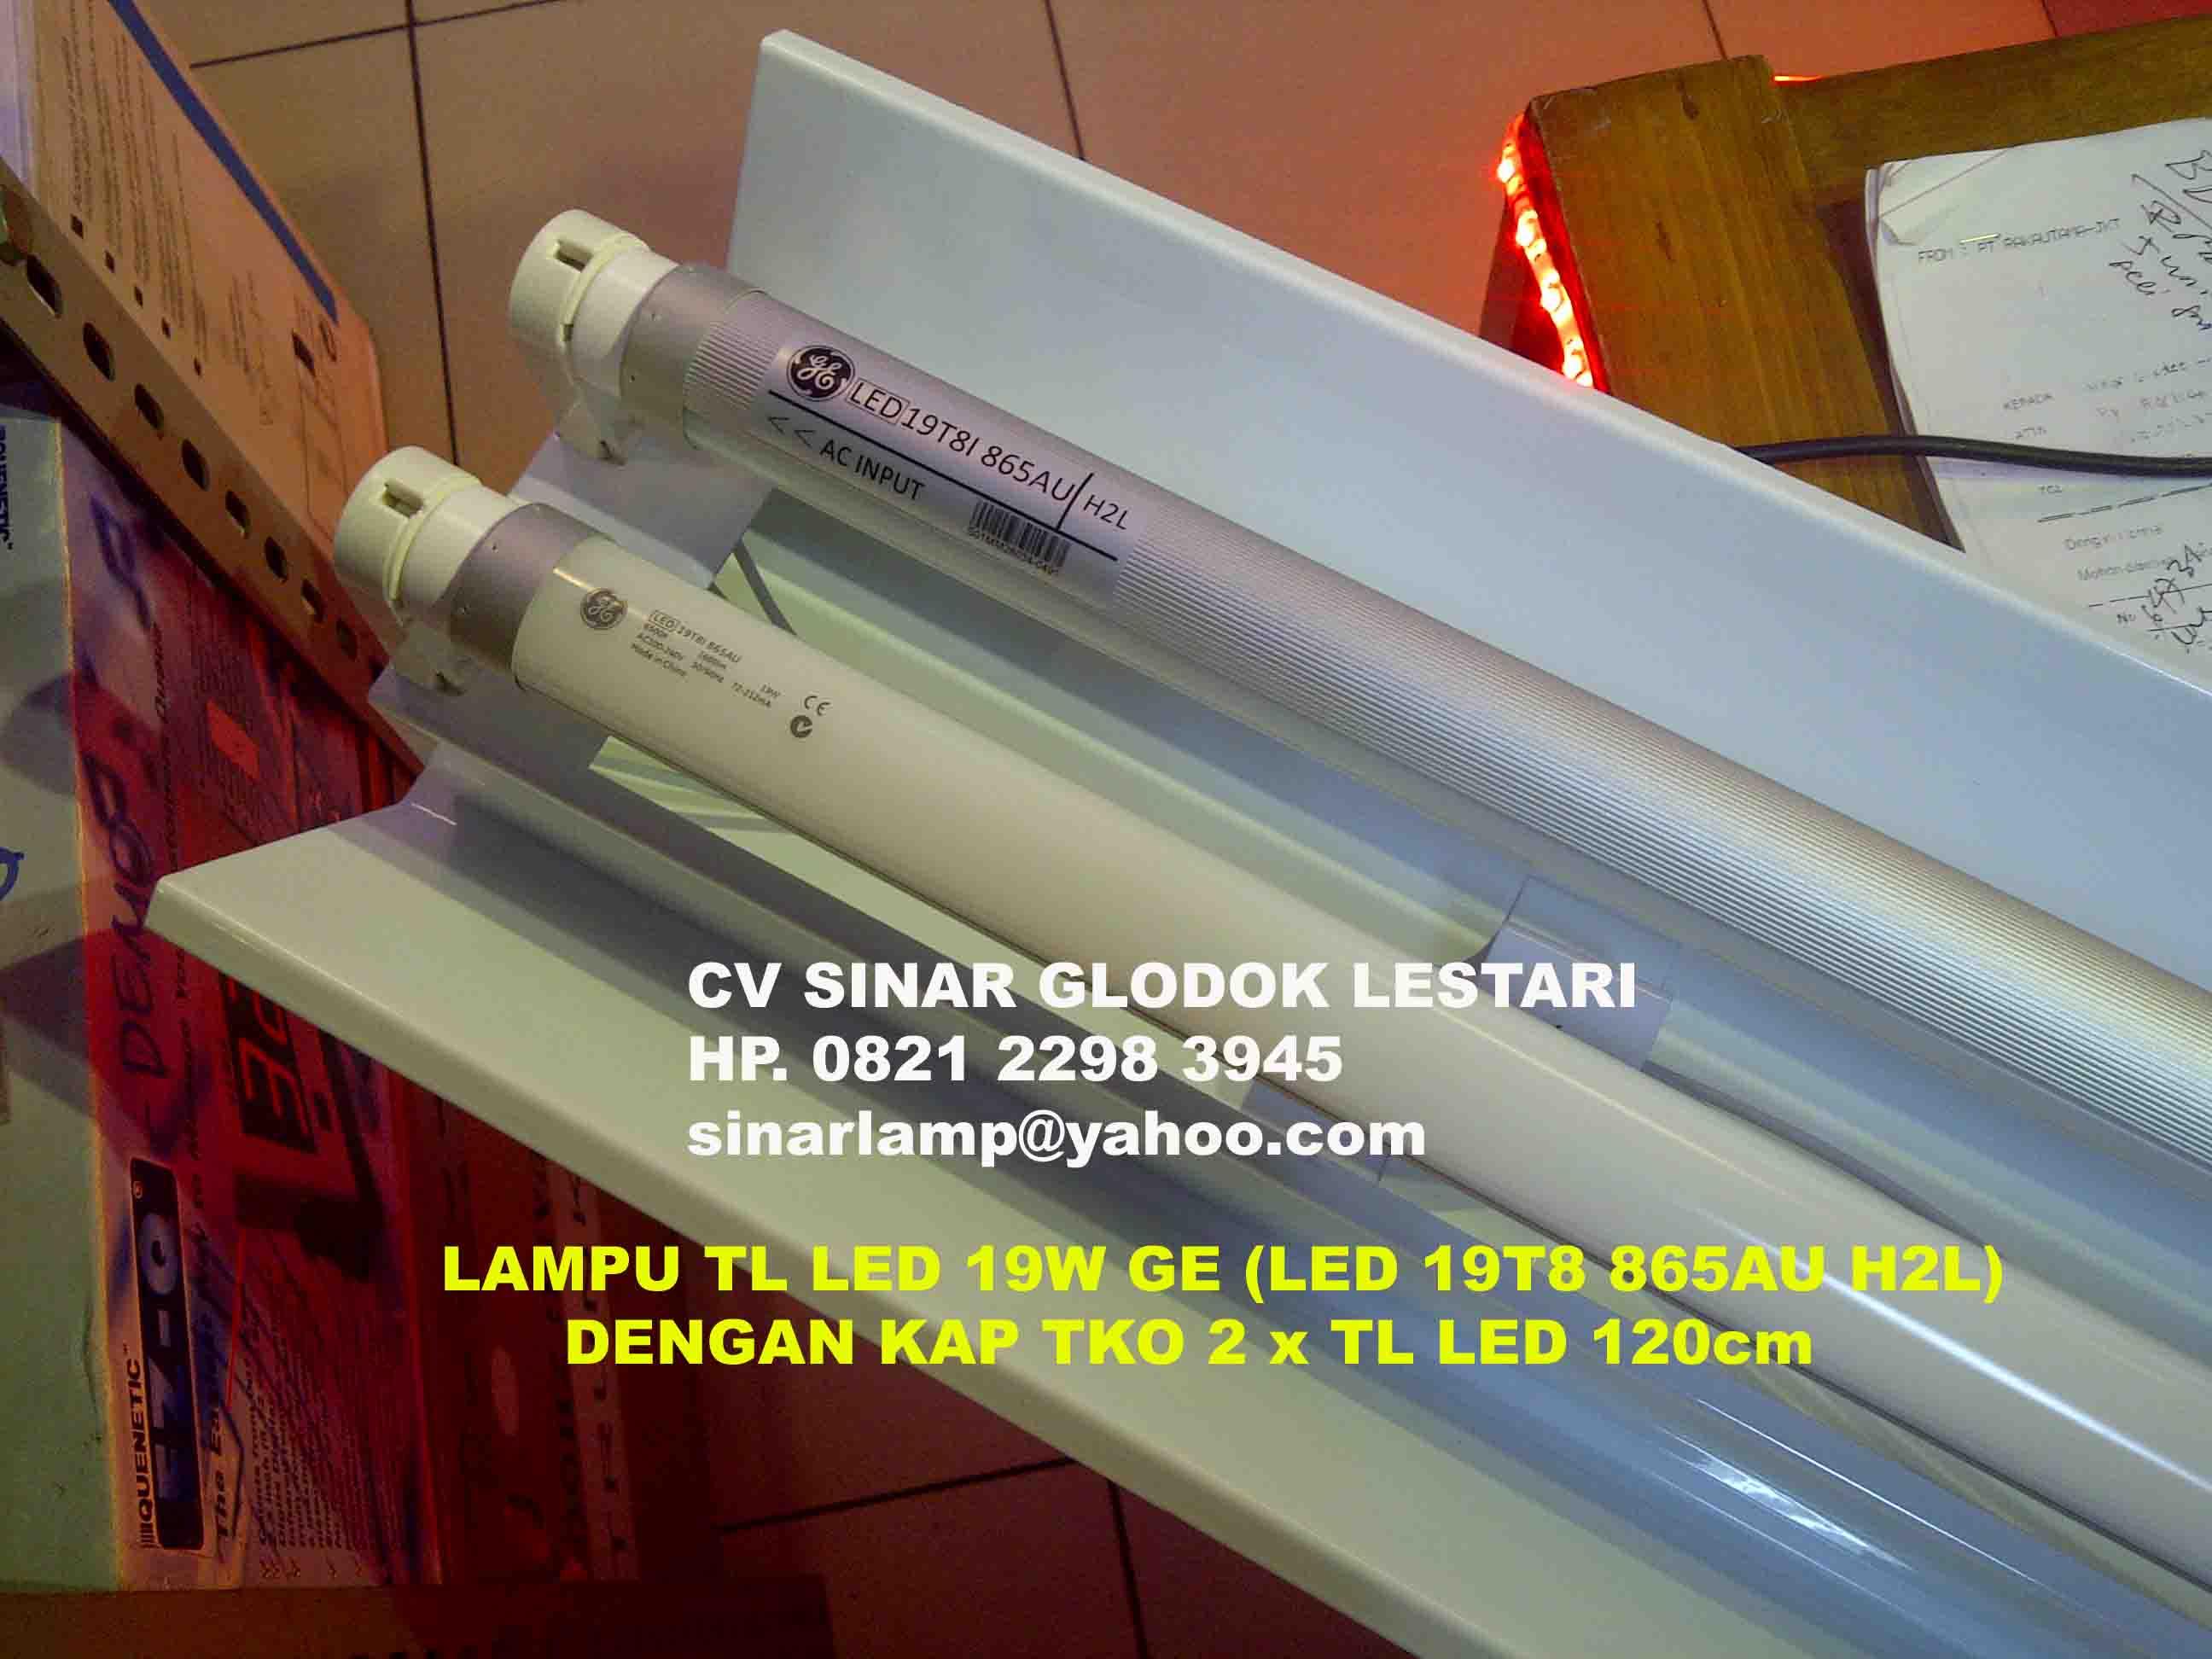 Harga Jual Lampu Led Philips T8 Aneka Tl Tube 20 Wiring